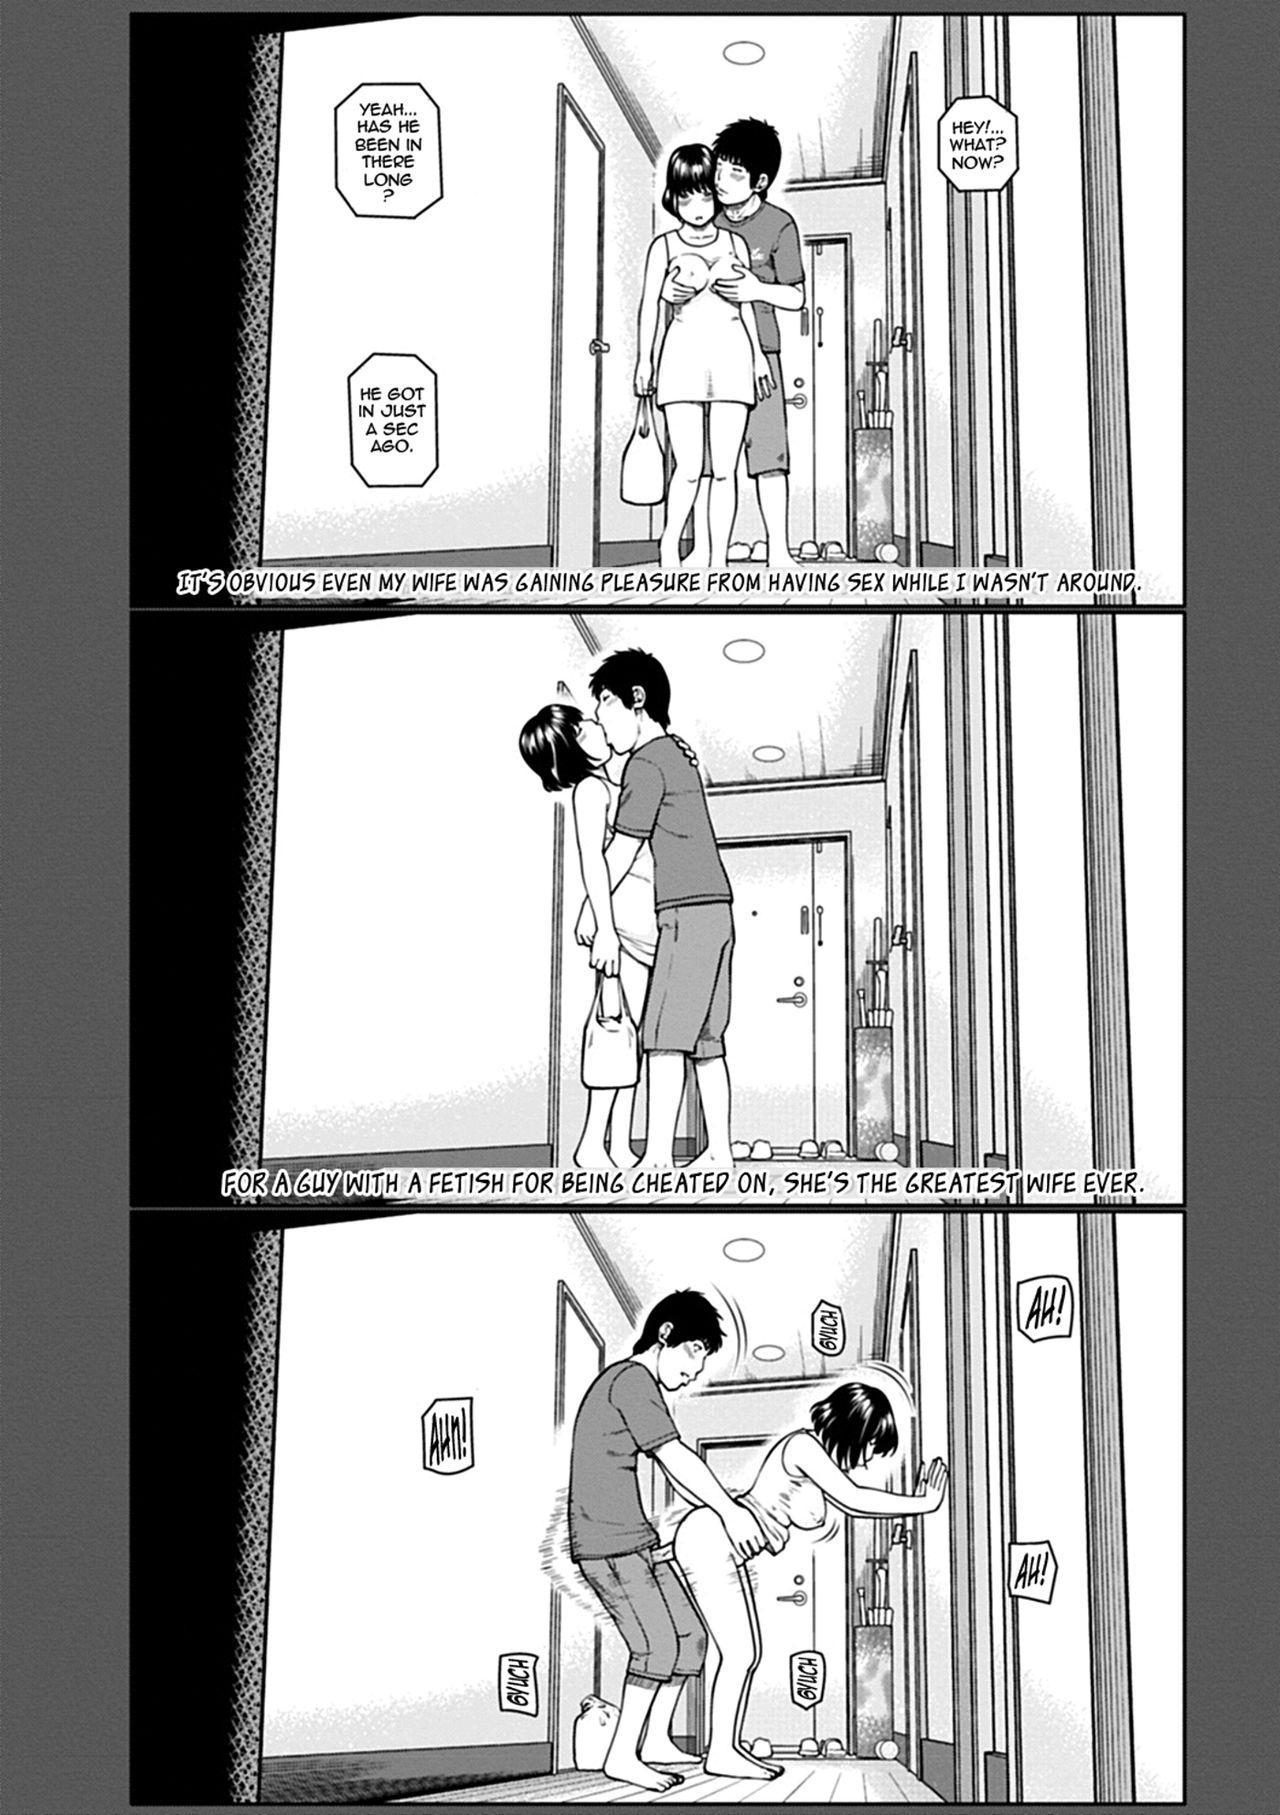 [Kuroki Hidehiko] 36-sai Injuku Sakarizuma | 36-Year-Old Randy Mature Wife [English] {Tadanohito} [Digital] [Uncensored] 163